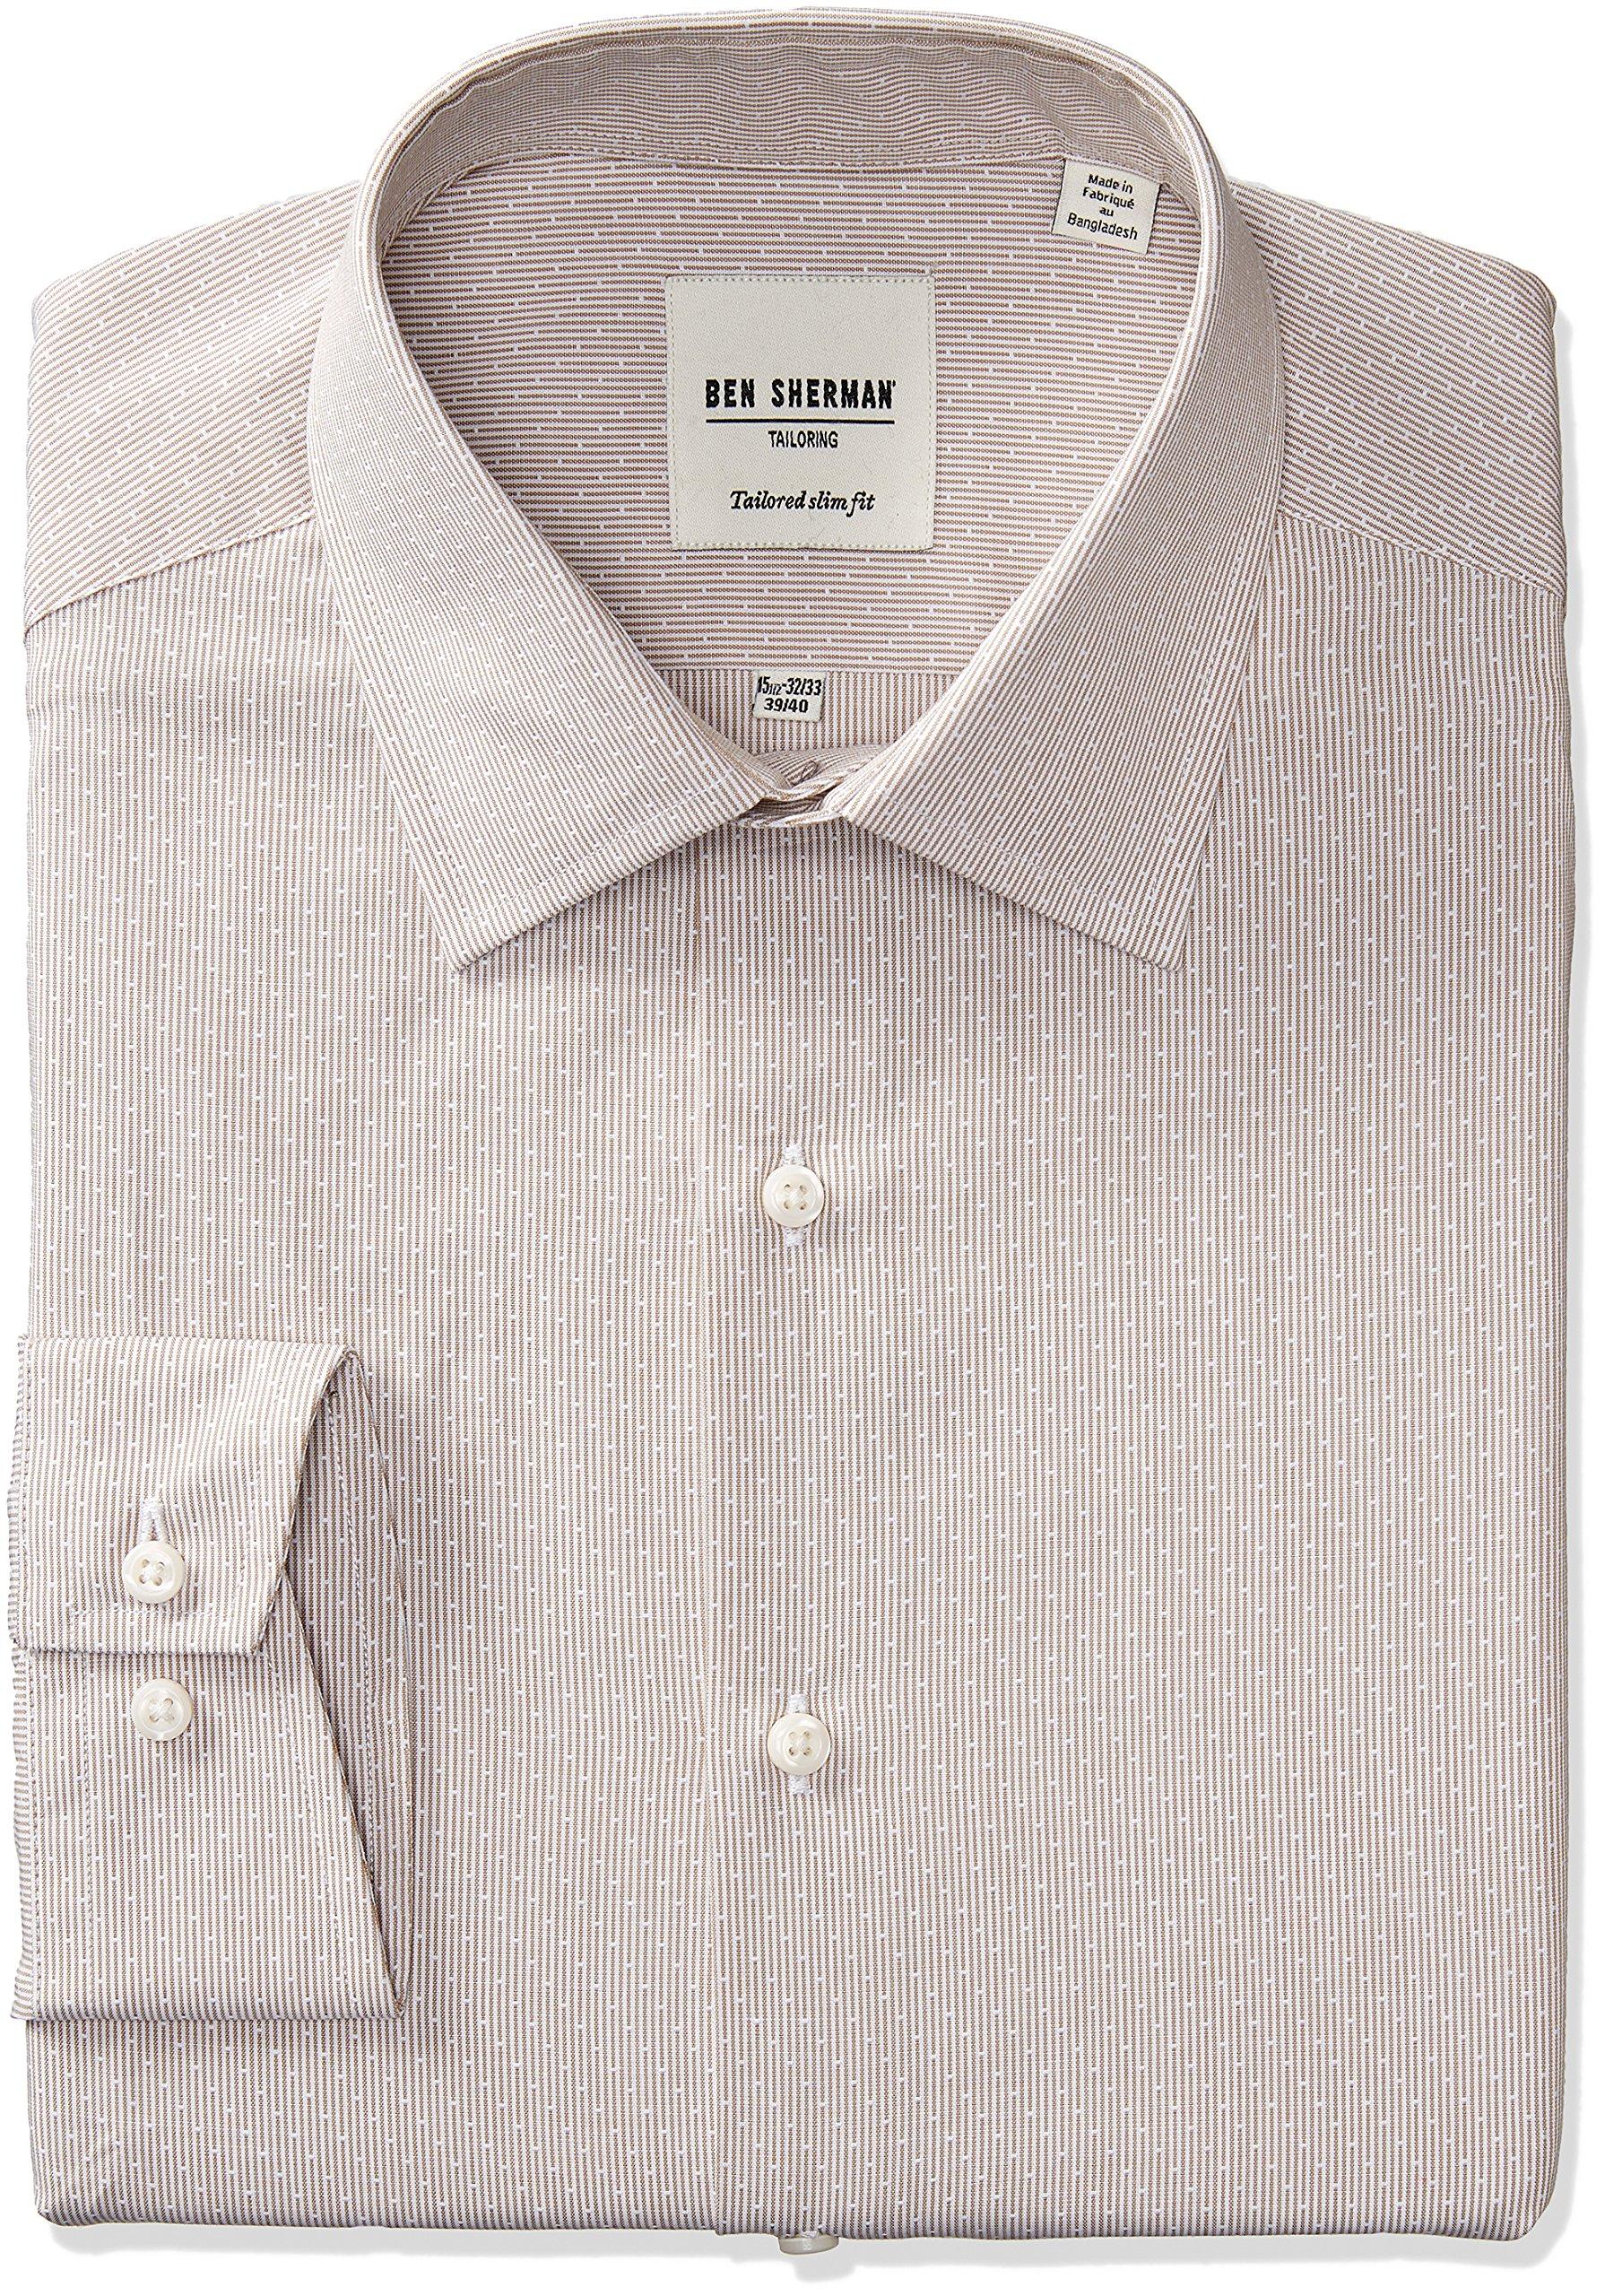 Ben Sherman Men's Slim Fit Dobby Stripe Spread Collar Dress Shirt, Tan, 15.5'' Neck 32''-33'' Sleeve